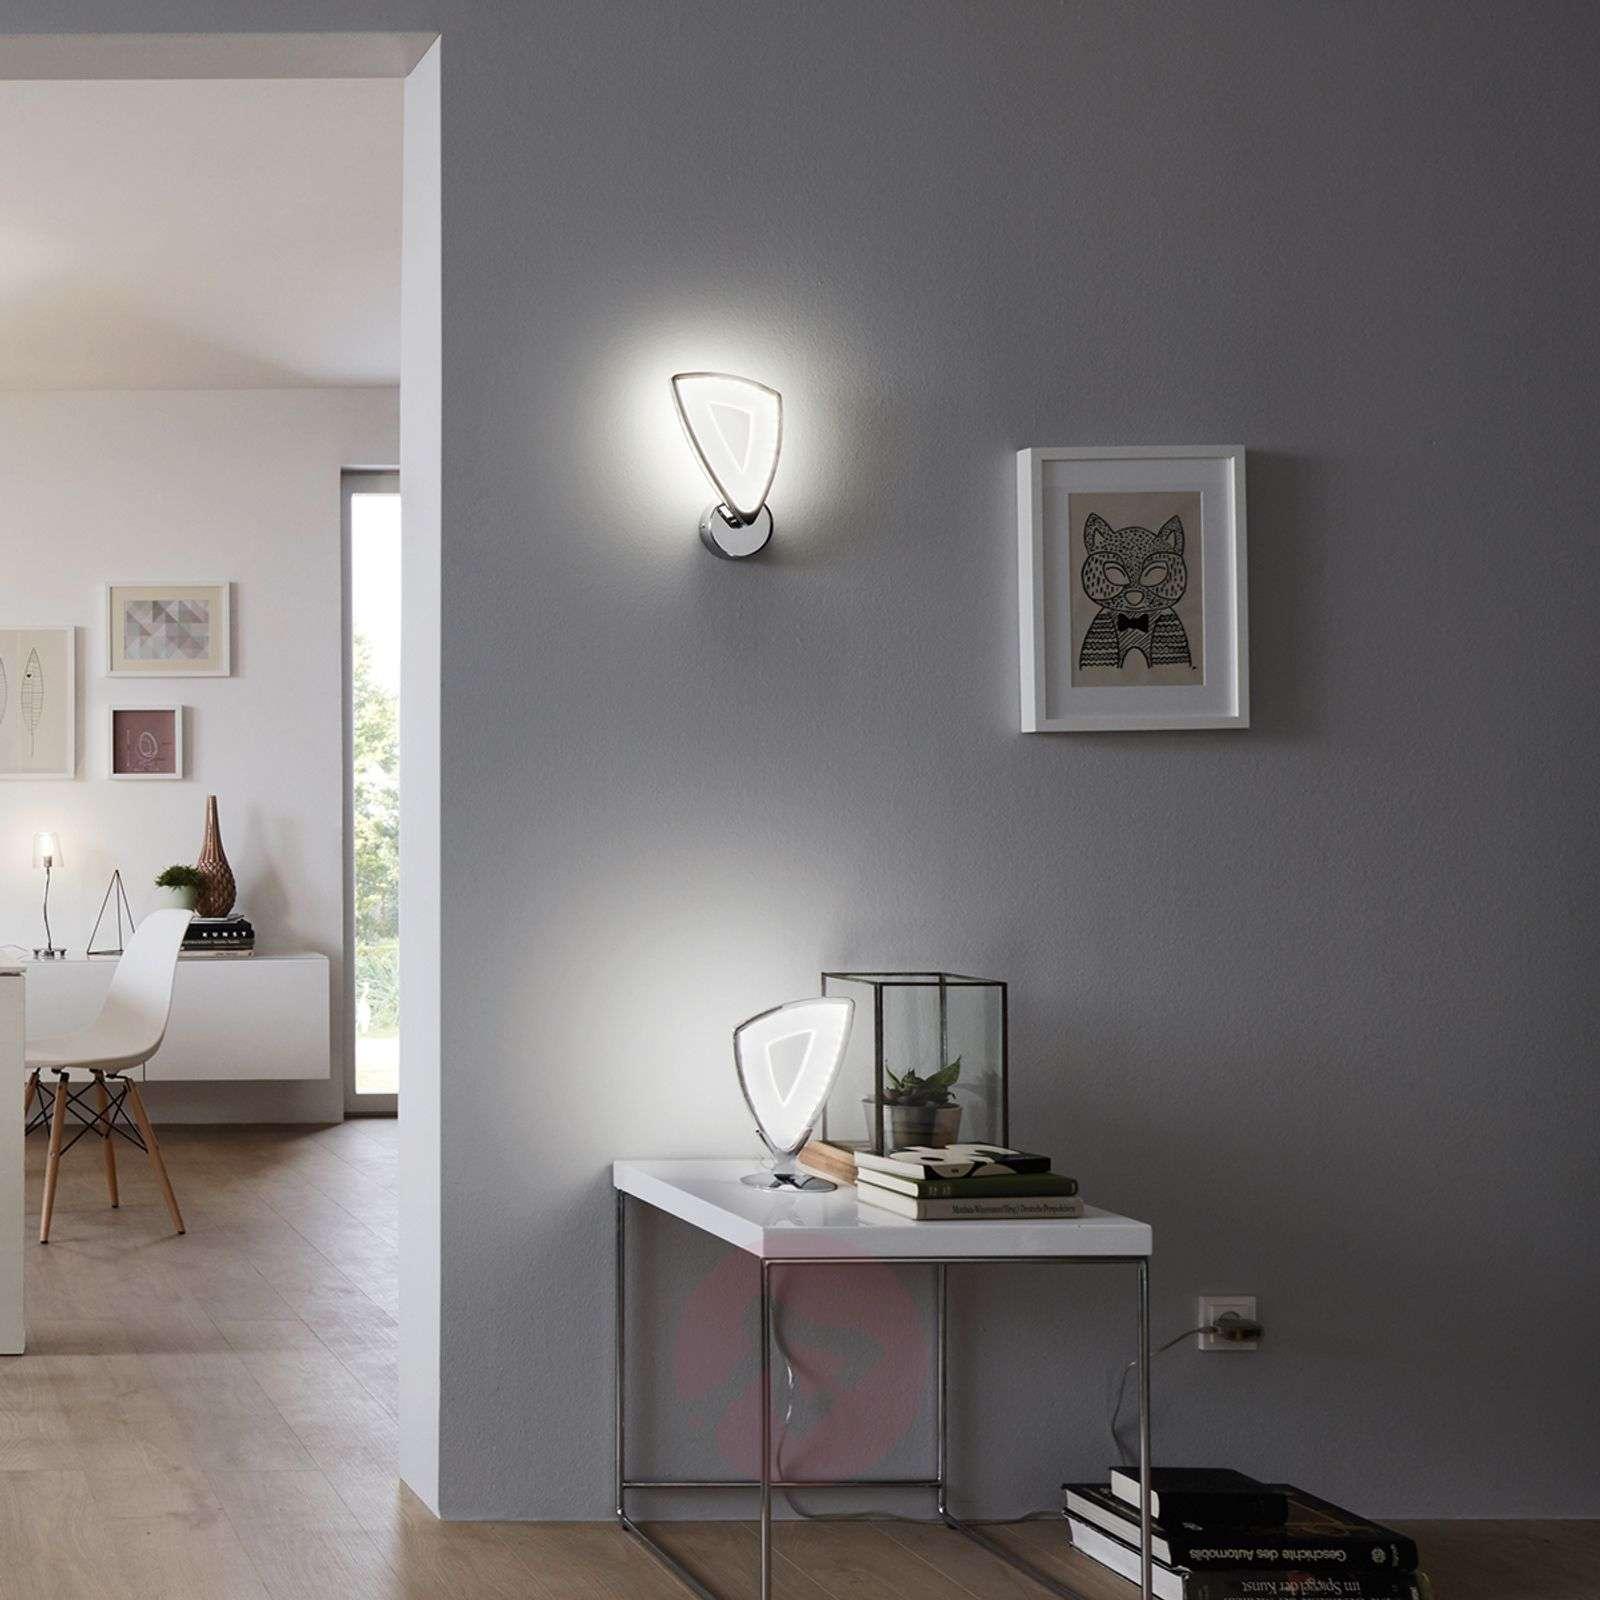 Ultra-modern Amonde table lamp with LED lighting-3031917-01